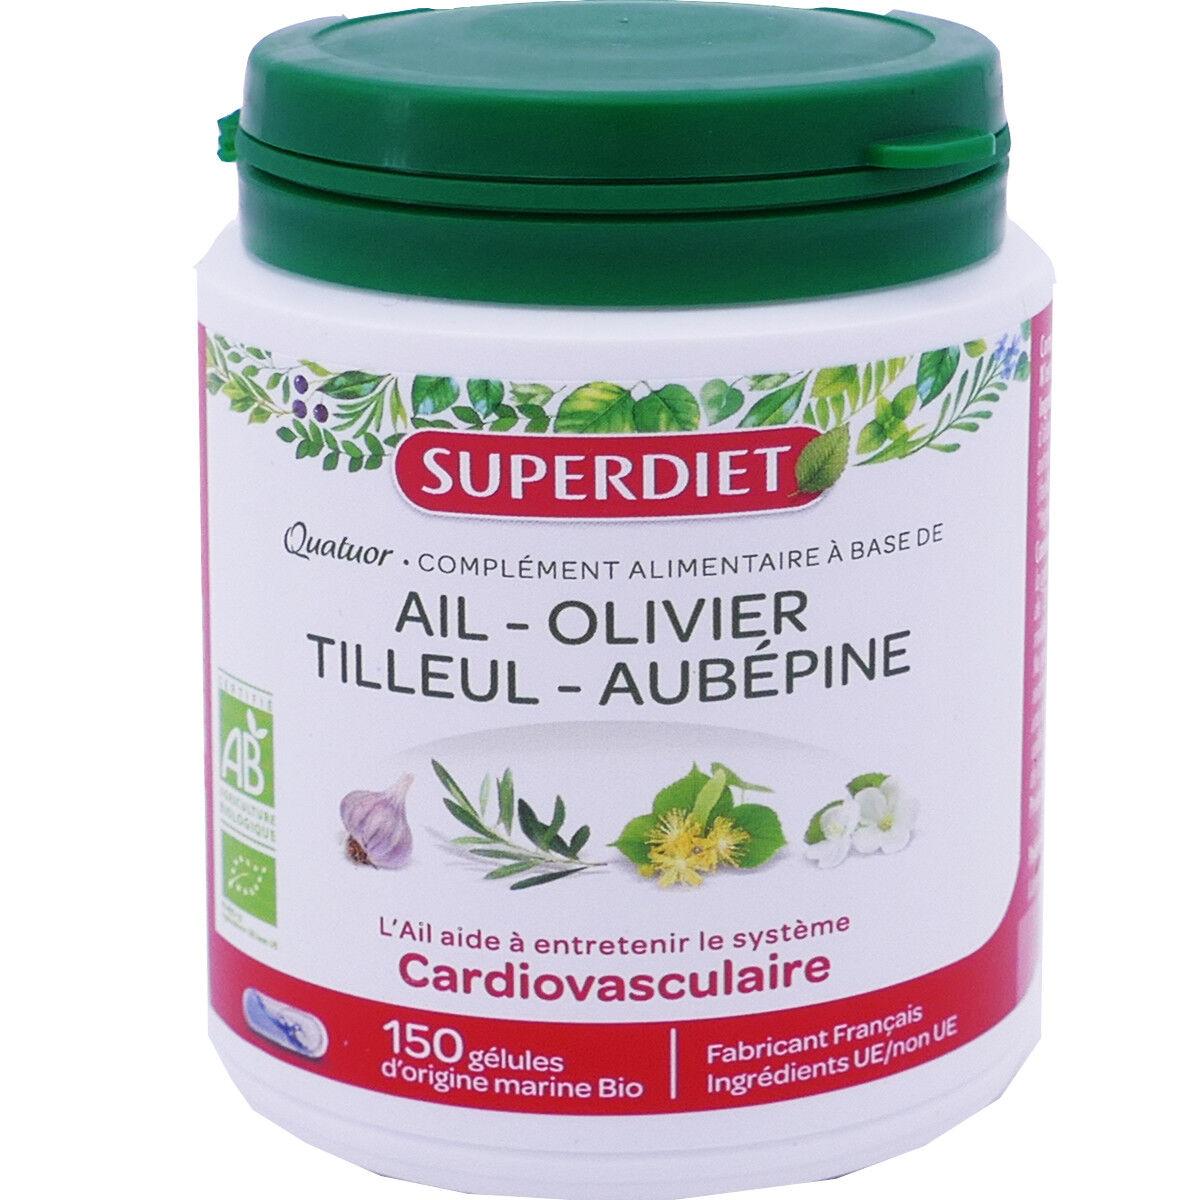 SUPER DIET Superdiet cardiovasculaire 150 gelules bio